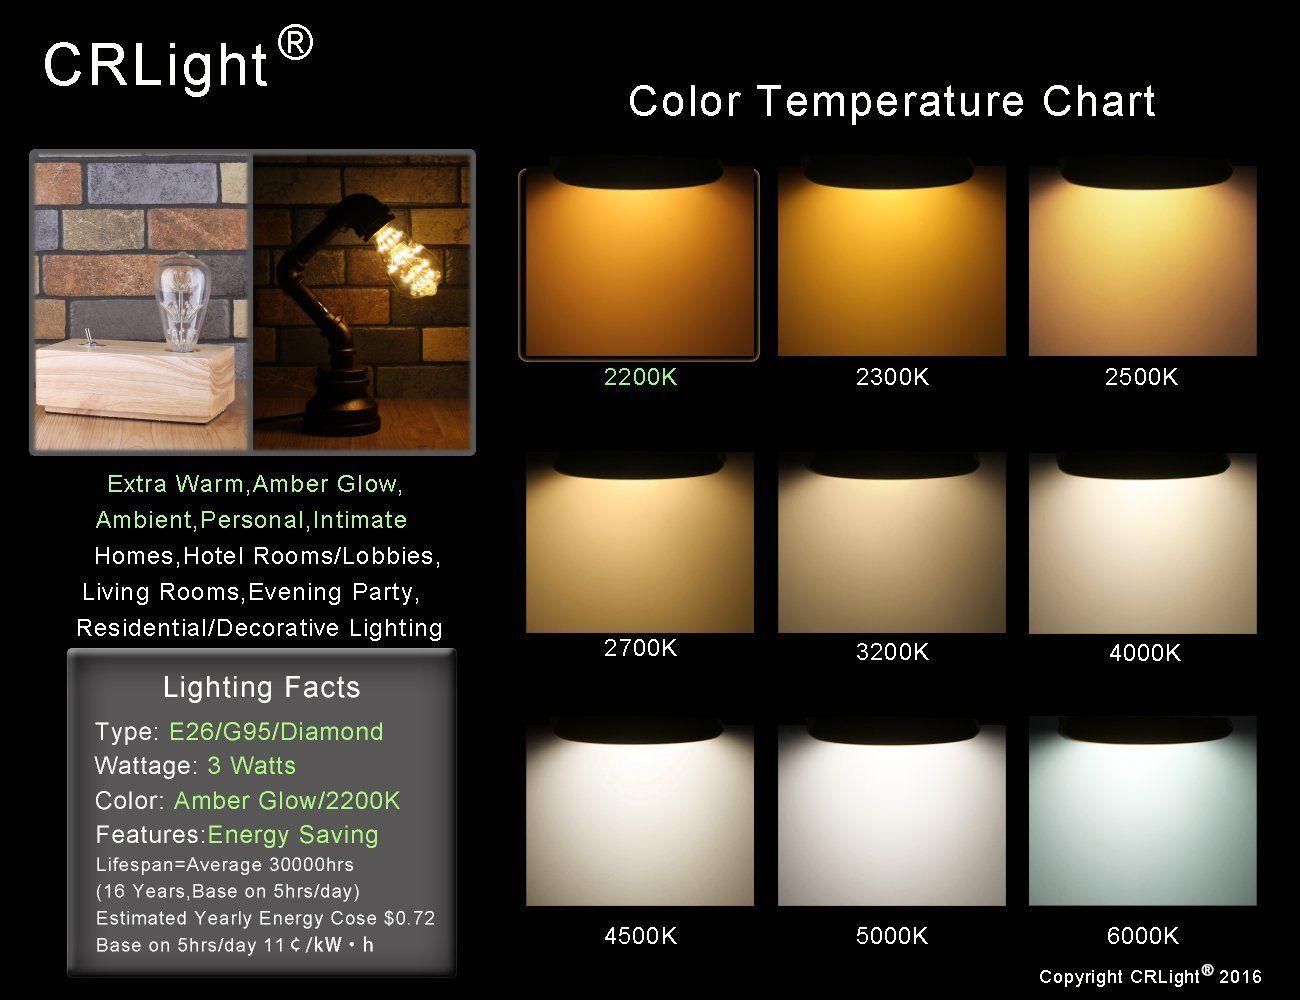 CRLight 3W Edison Style Vintage LED Decorative Light Bulb